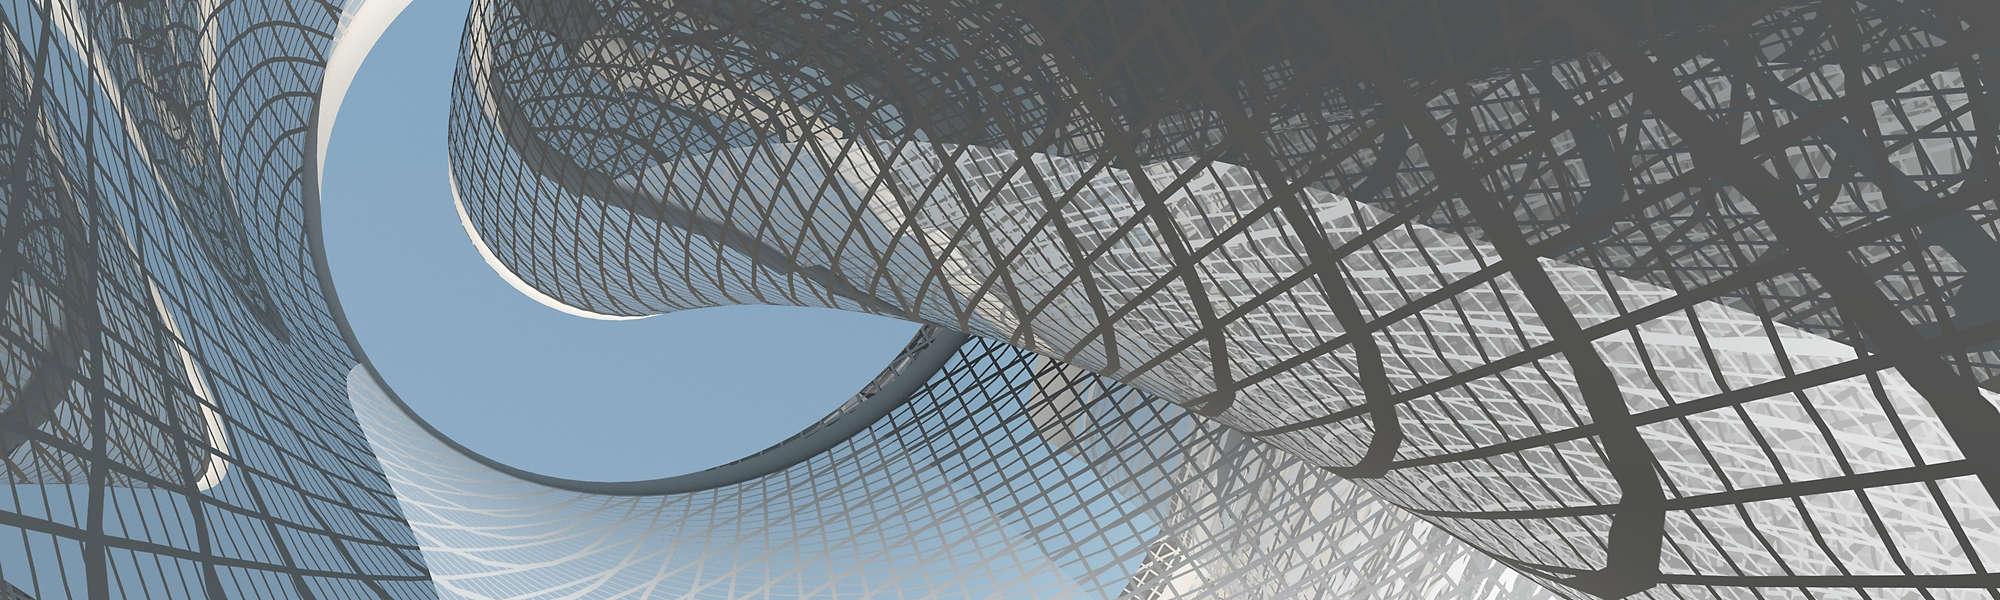 Contemporary architecture curve metallic sky